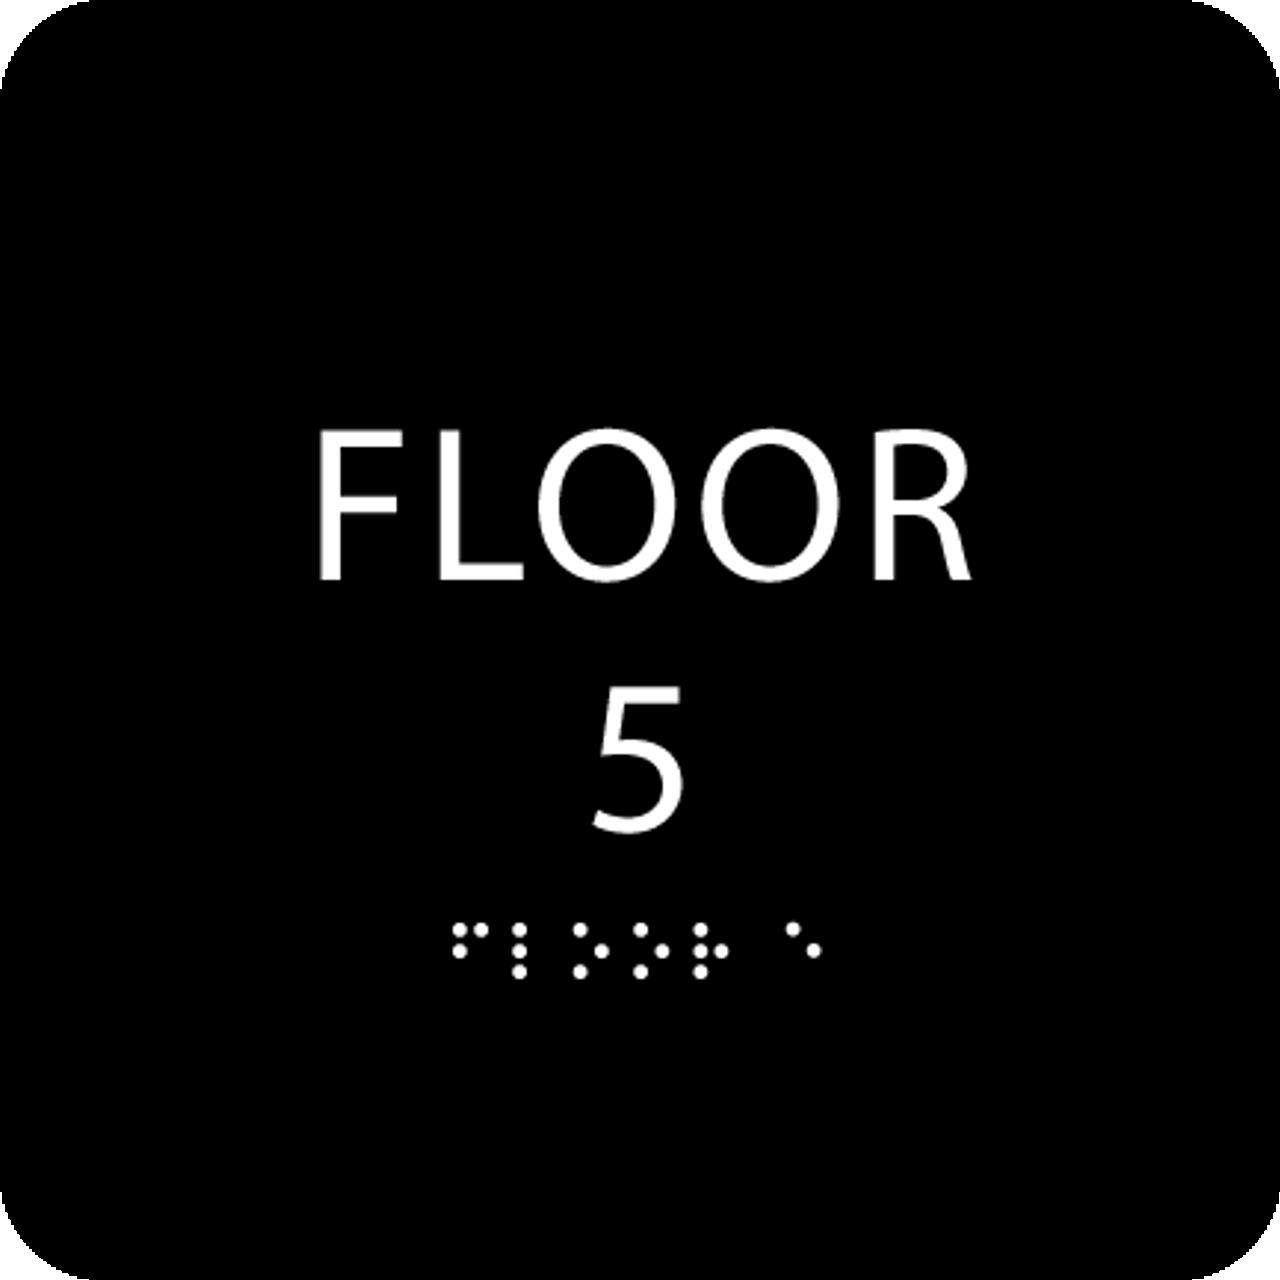 Black Floor 5 Level Identification Sign